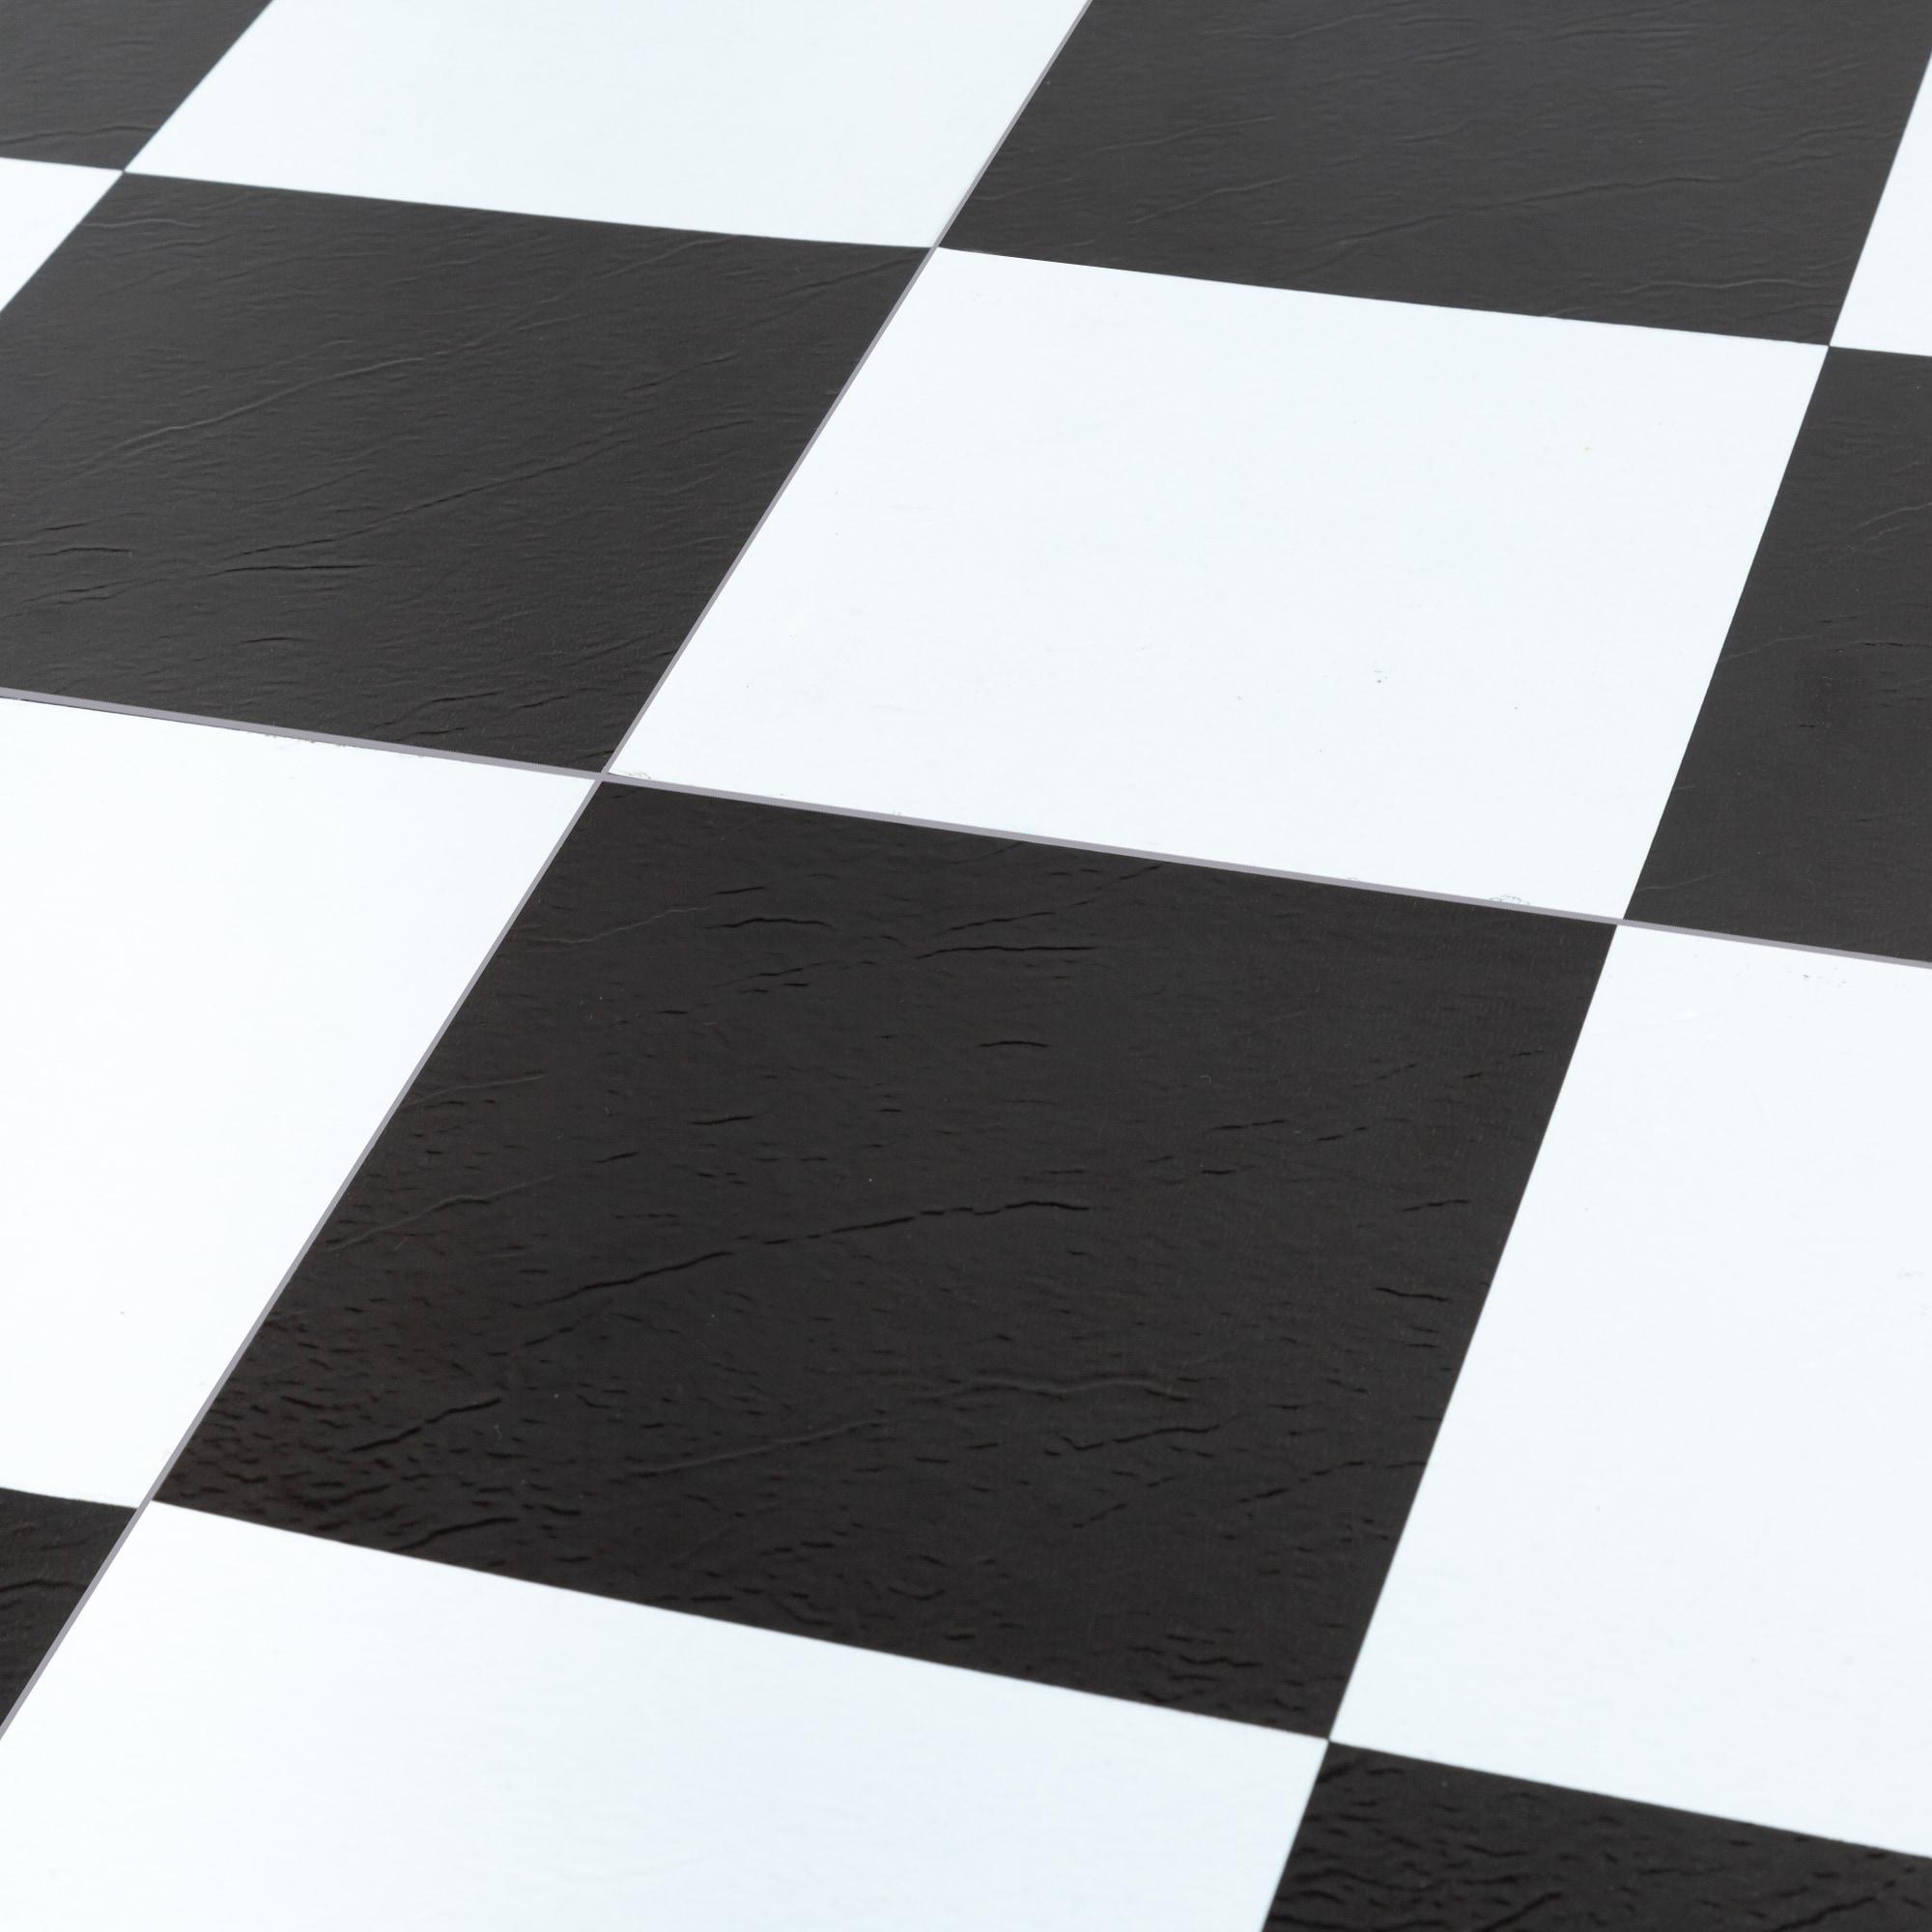 Black & White / 1.2mm / PVC / Peel & Stick Vinyl Tile - 1.2mm PVC Peel & Stick - Sterling Collection 0